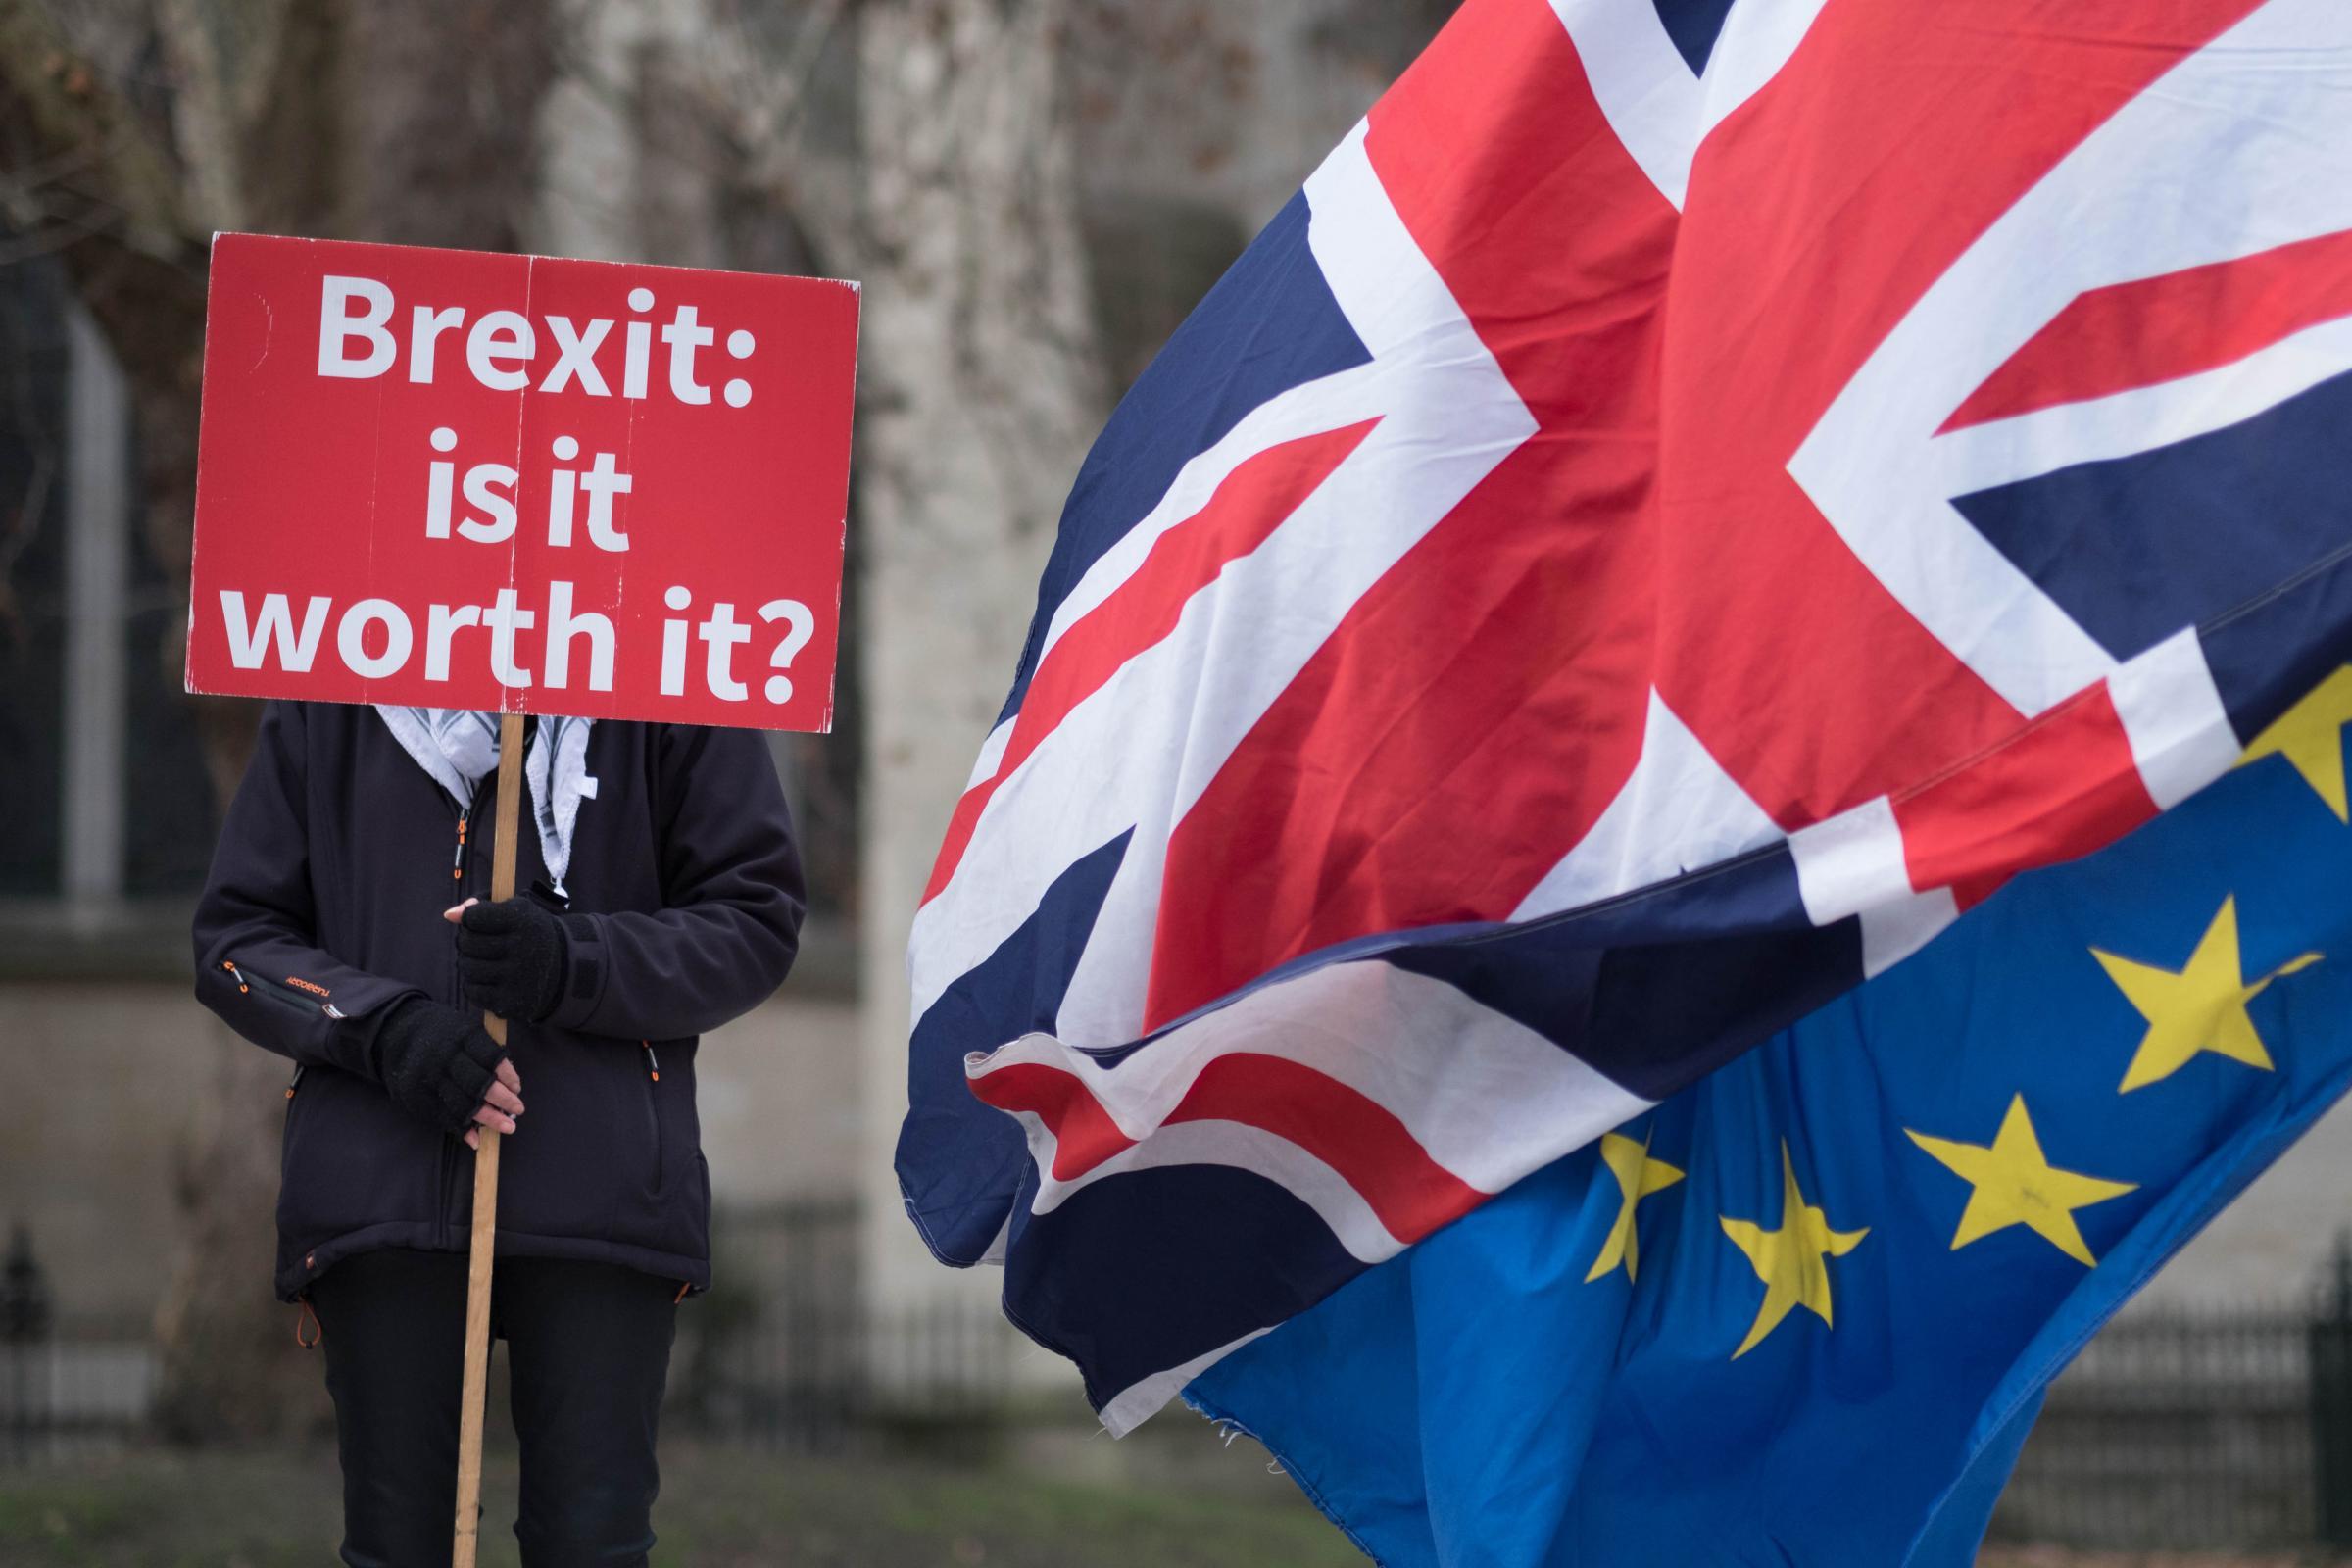 POLL: The great BREXIT debate: Vote in Somerset's EU Referendum